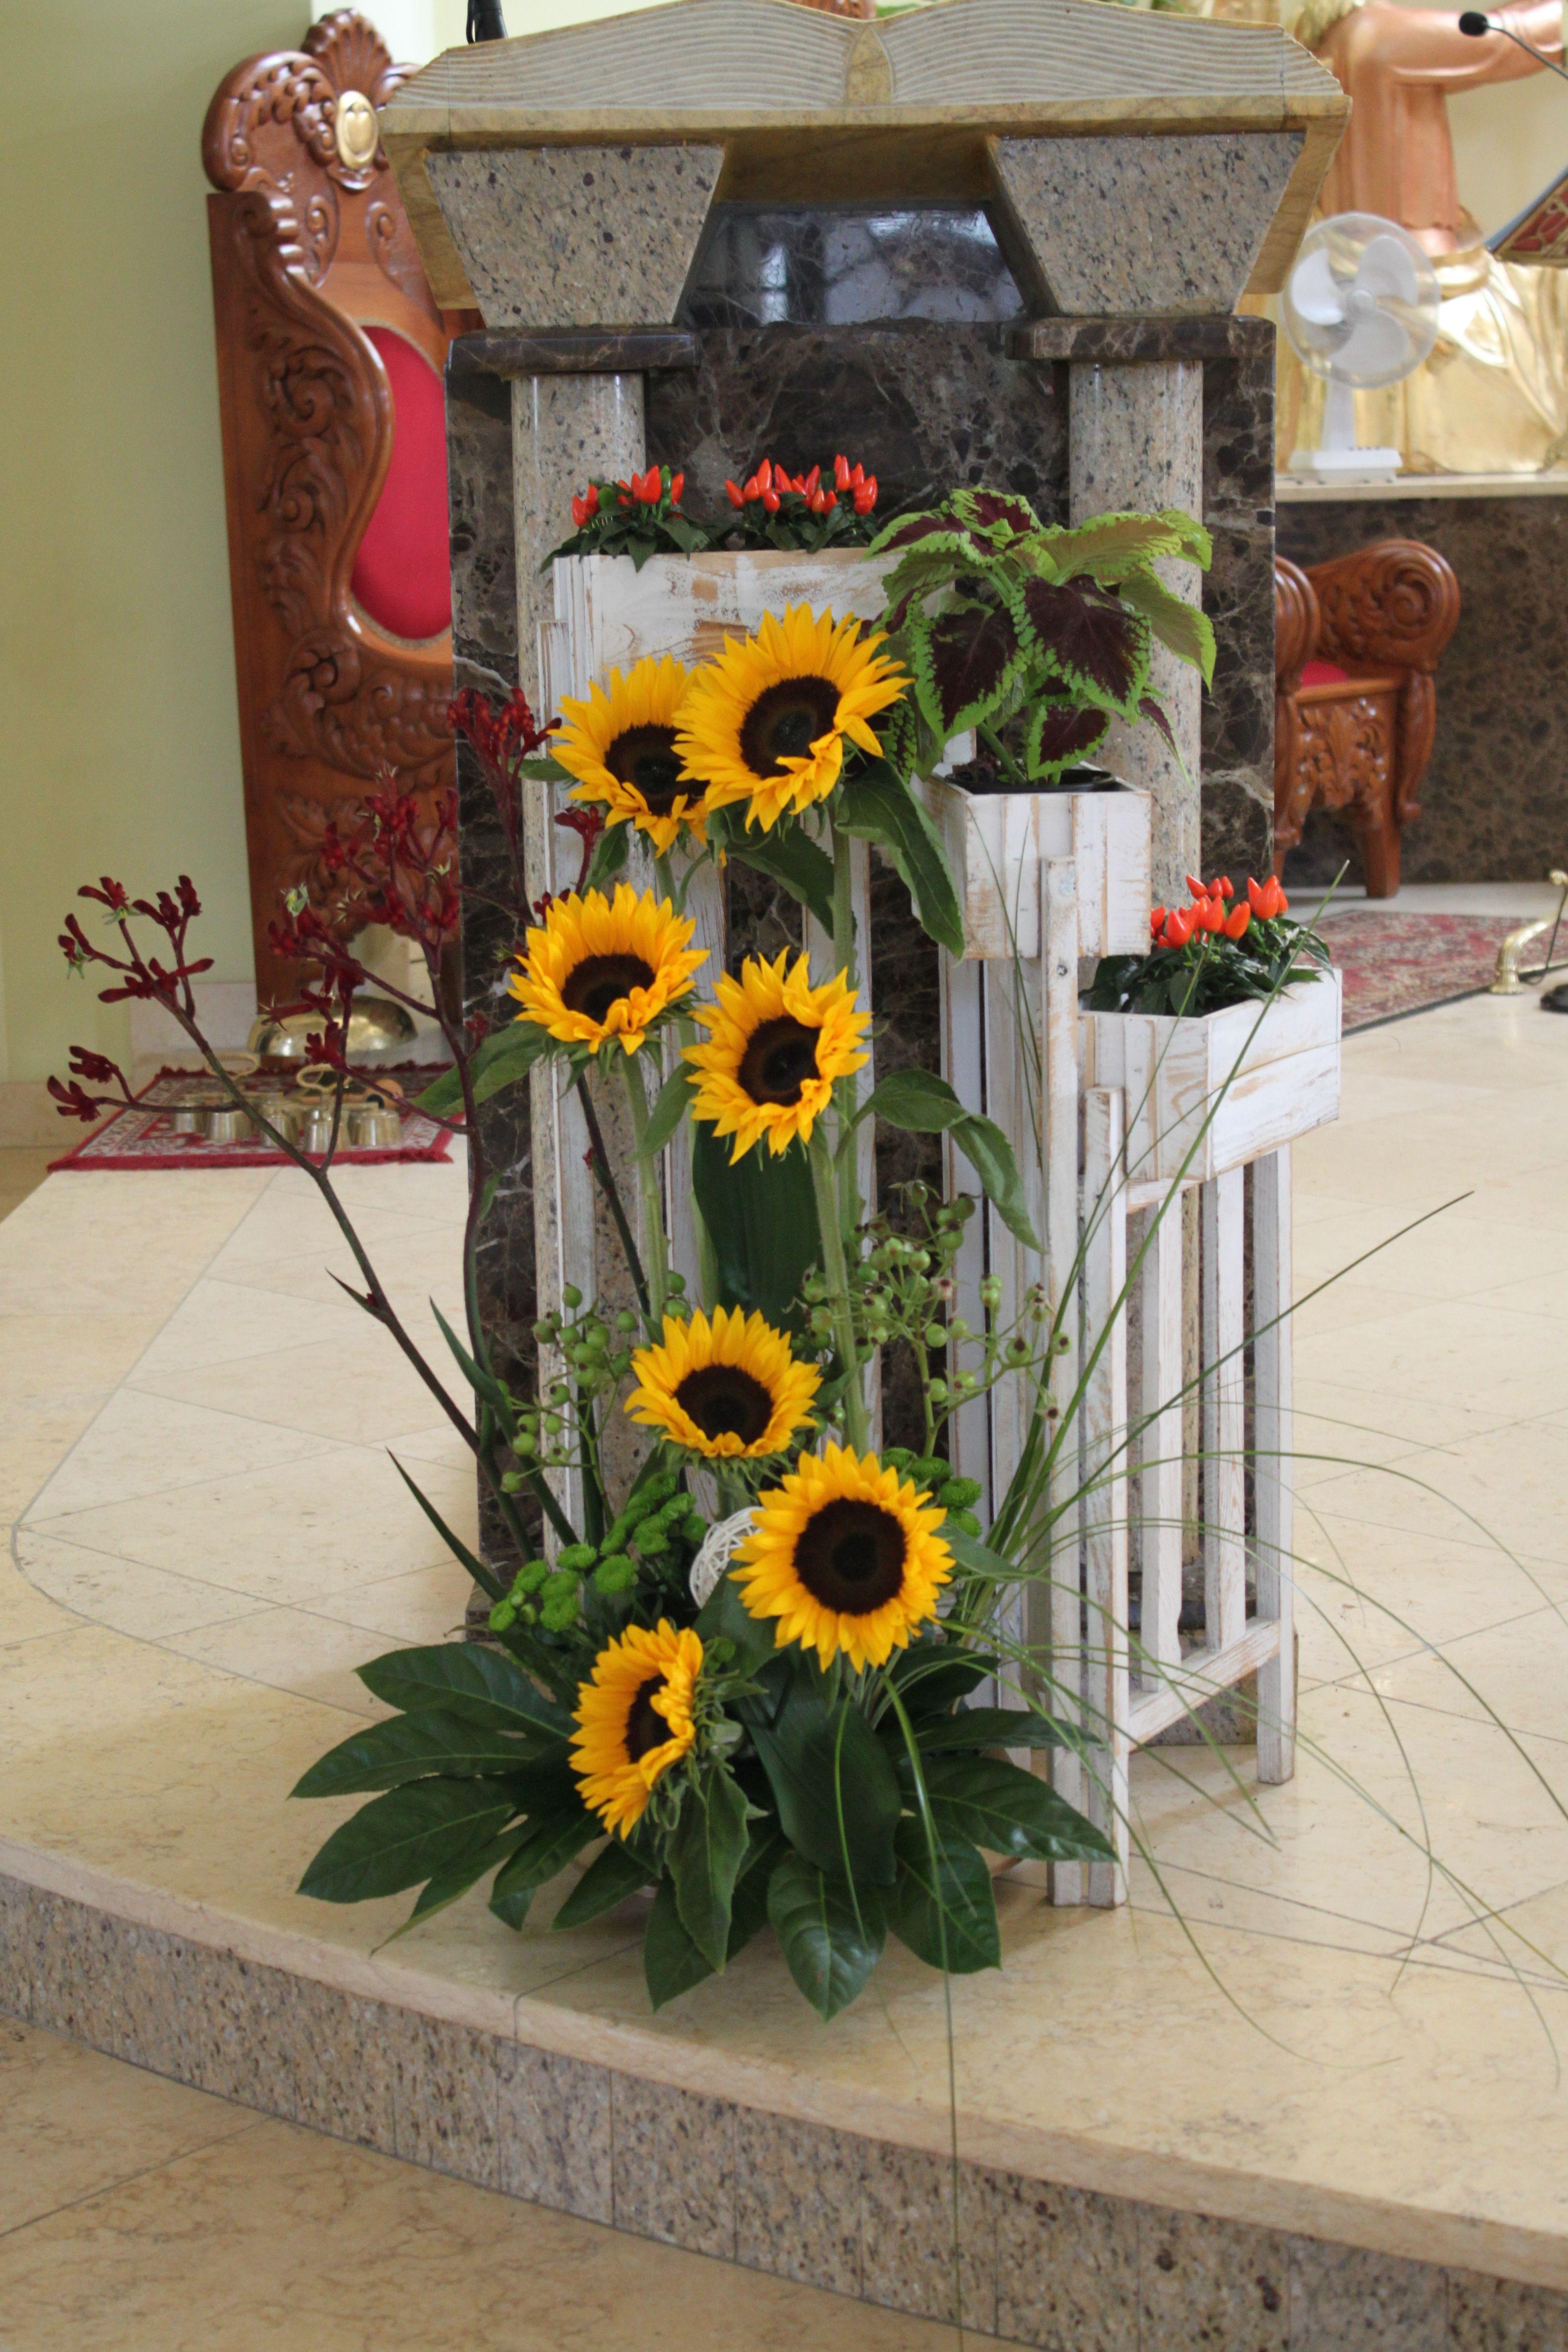 Pin De Branca Matias Em Arranjos De Flores Grandes Arranjos De